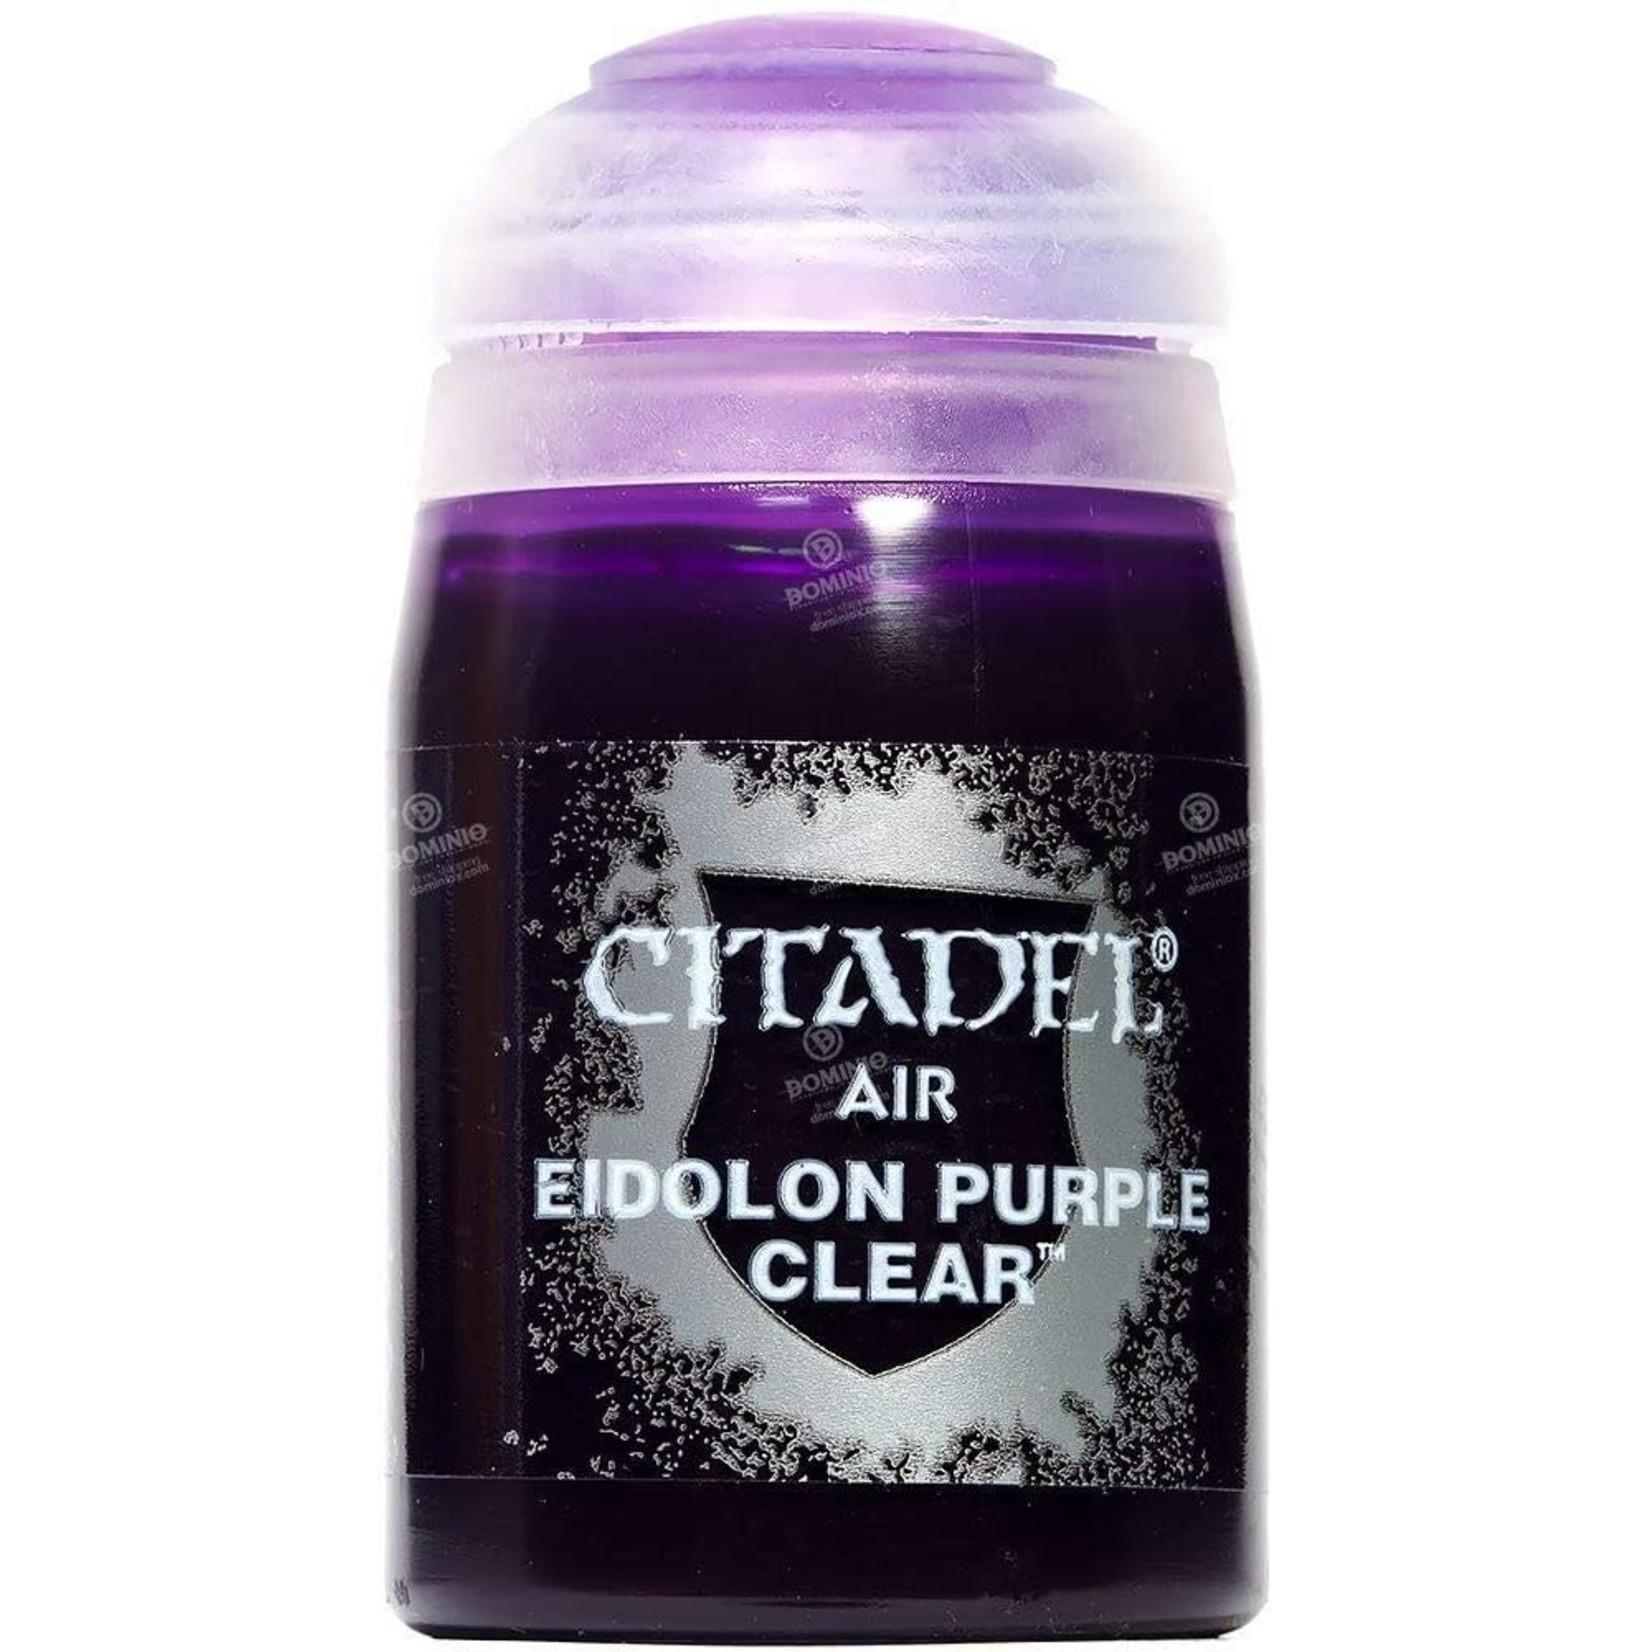 Games Workshop Citadel Paint: Eidolon Purple Clear Air (24 ml)